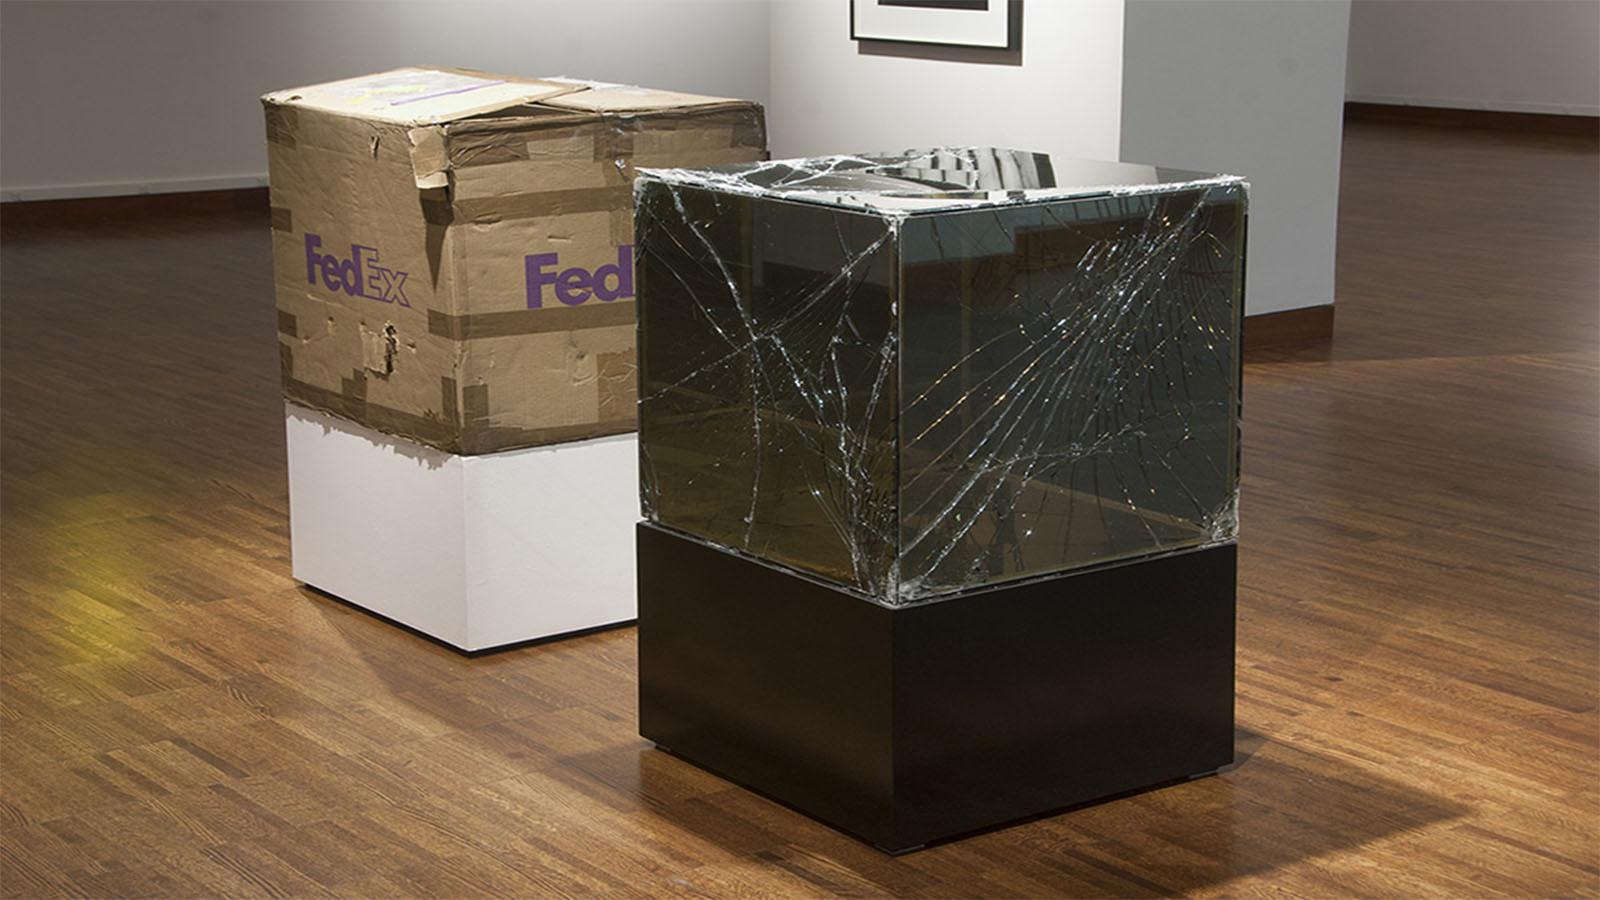 Artista envía por FedEx esculturas destrozadas para exponerlas